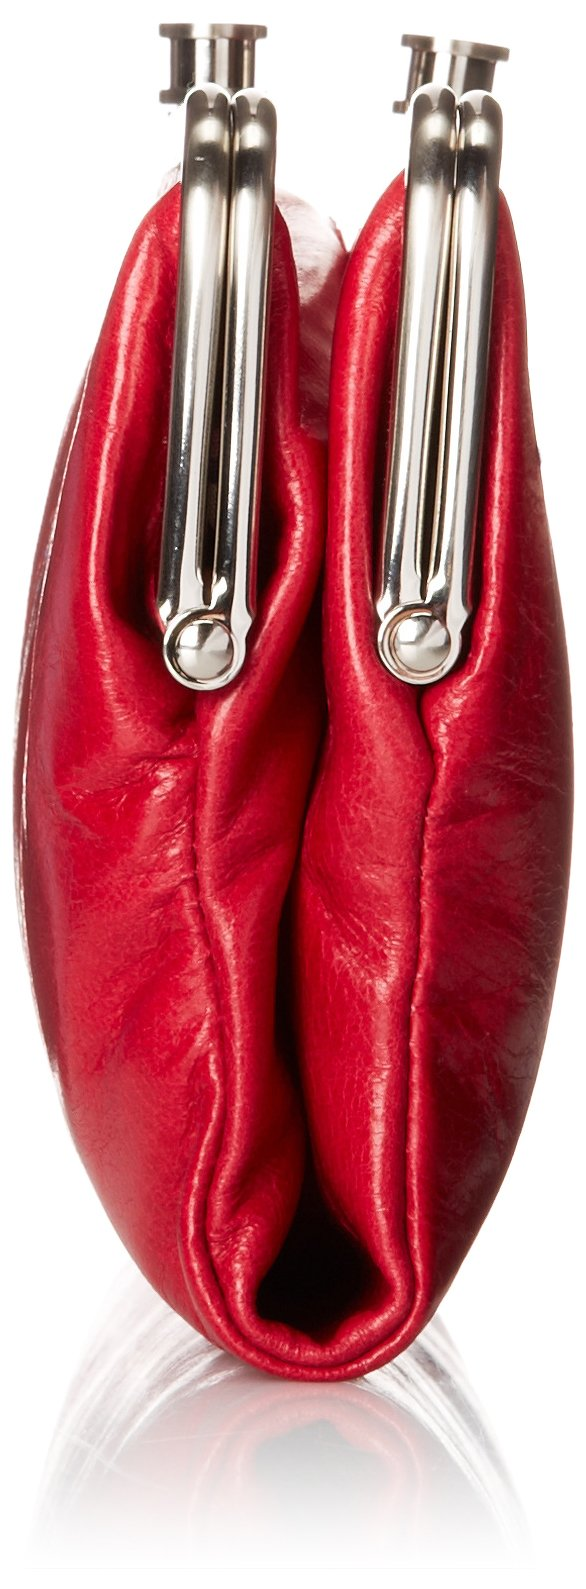 HOBO Lauren Wallet,Garnet,One Size by HOBO (Image #3)